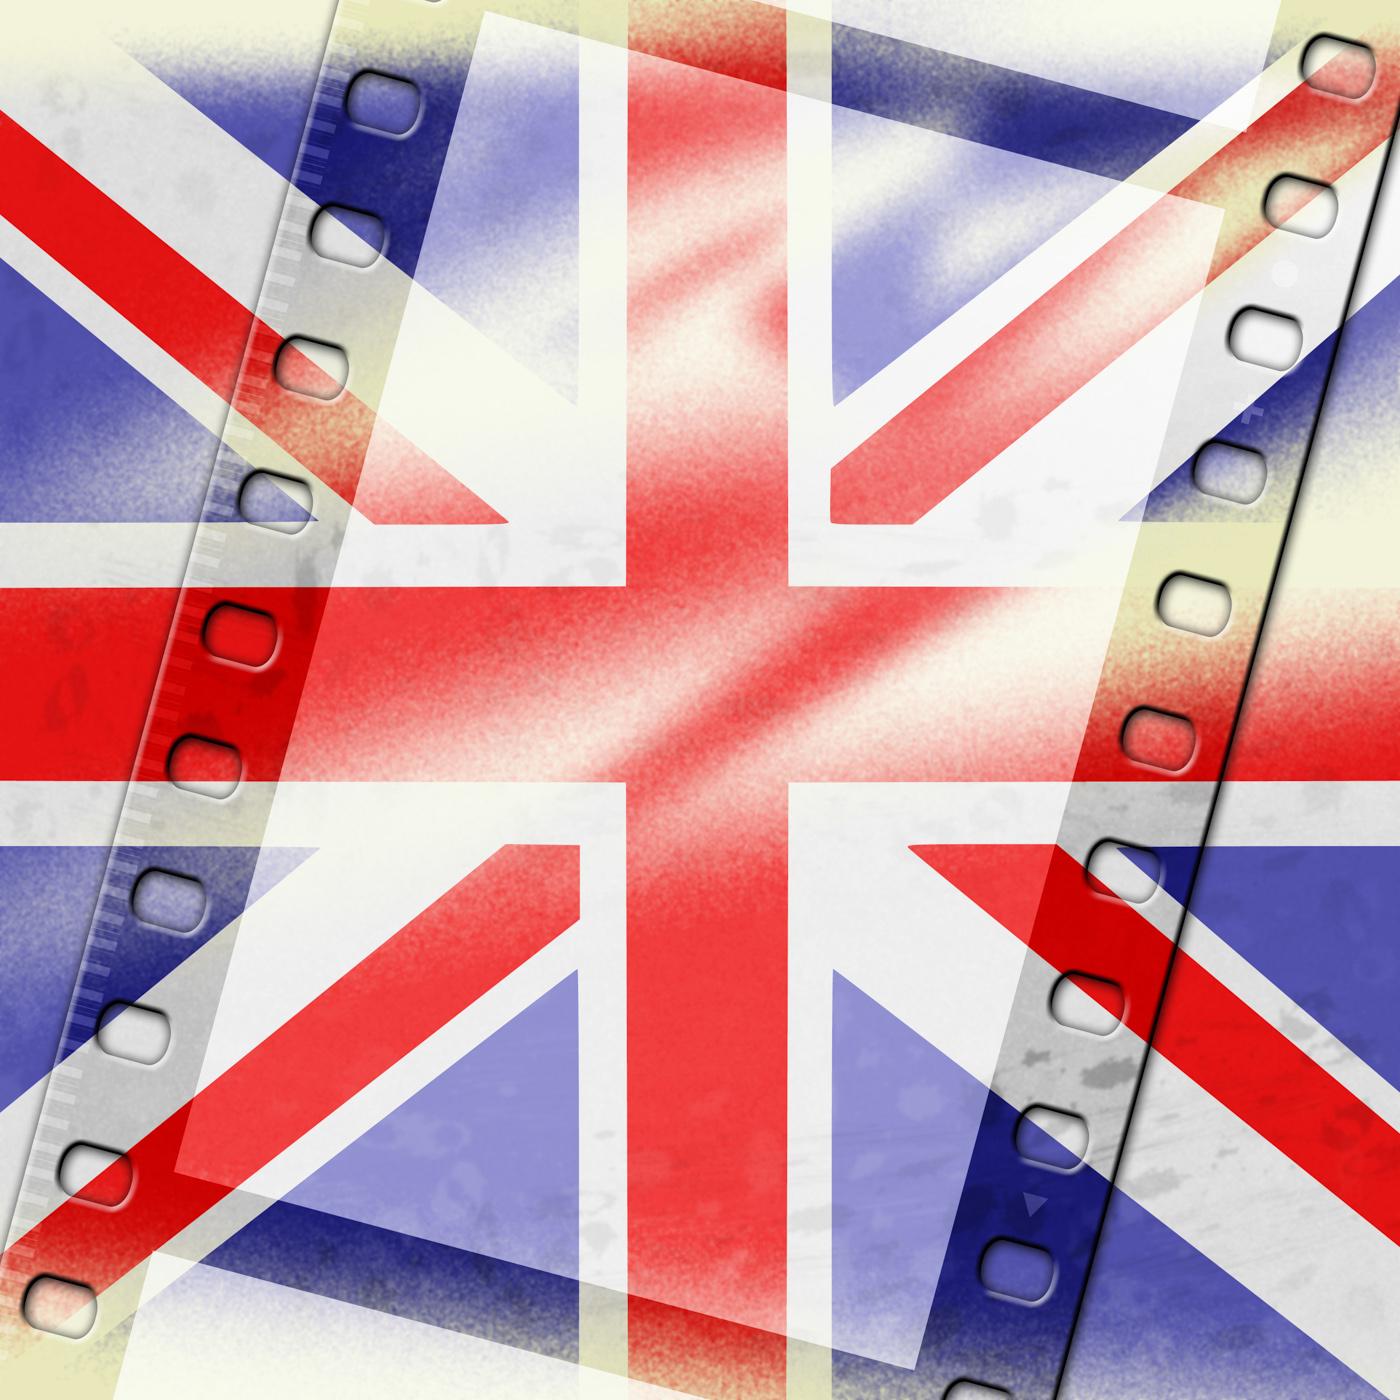 Union jack represents british flag and background photo